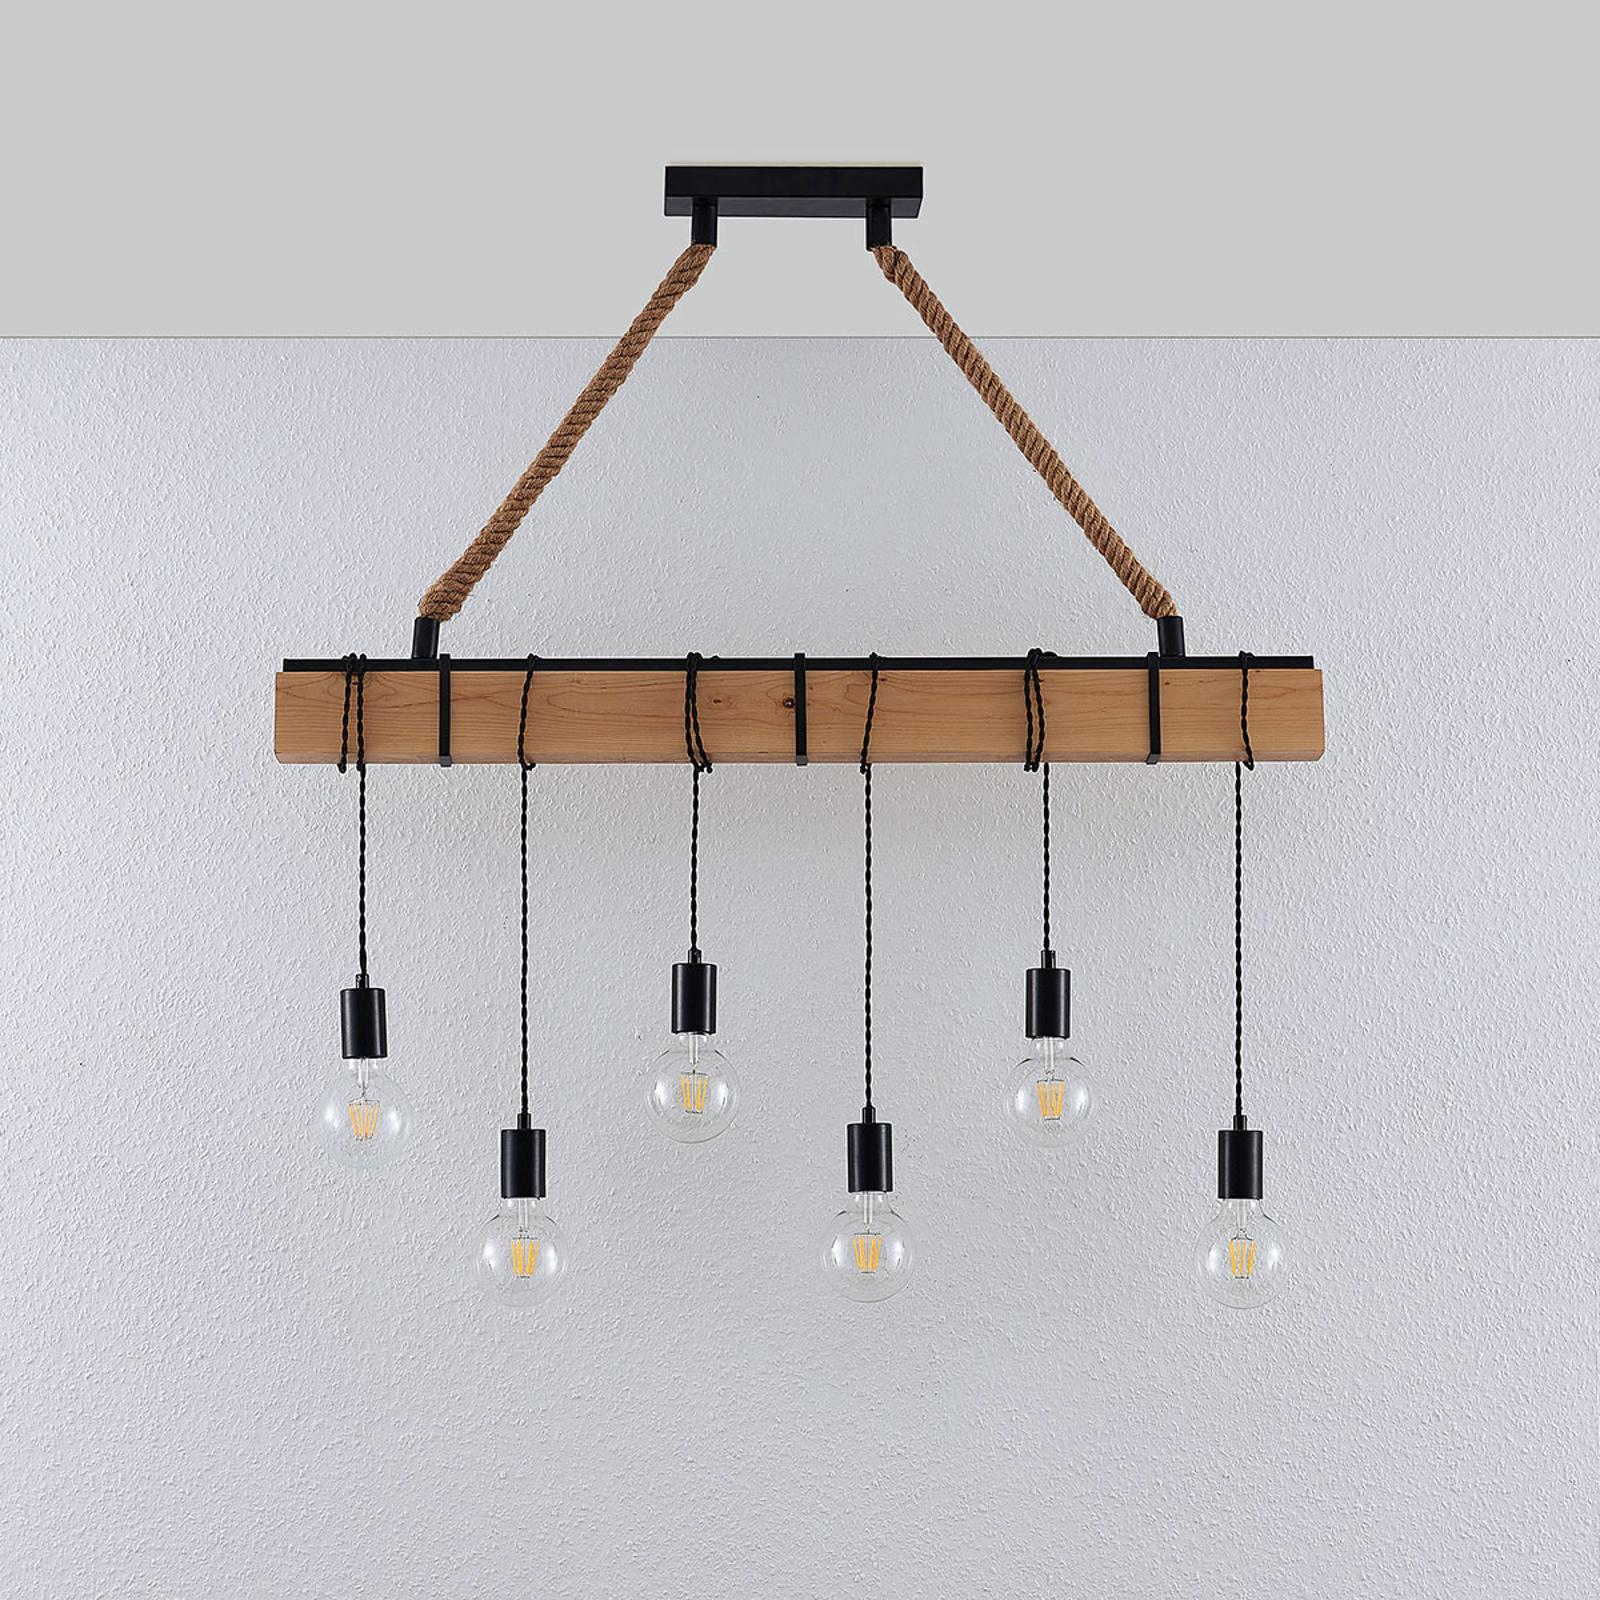 Lampe Holzbalken Wand